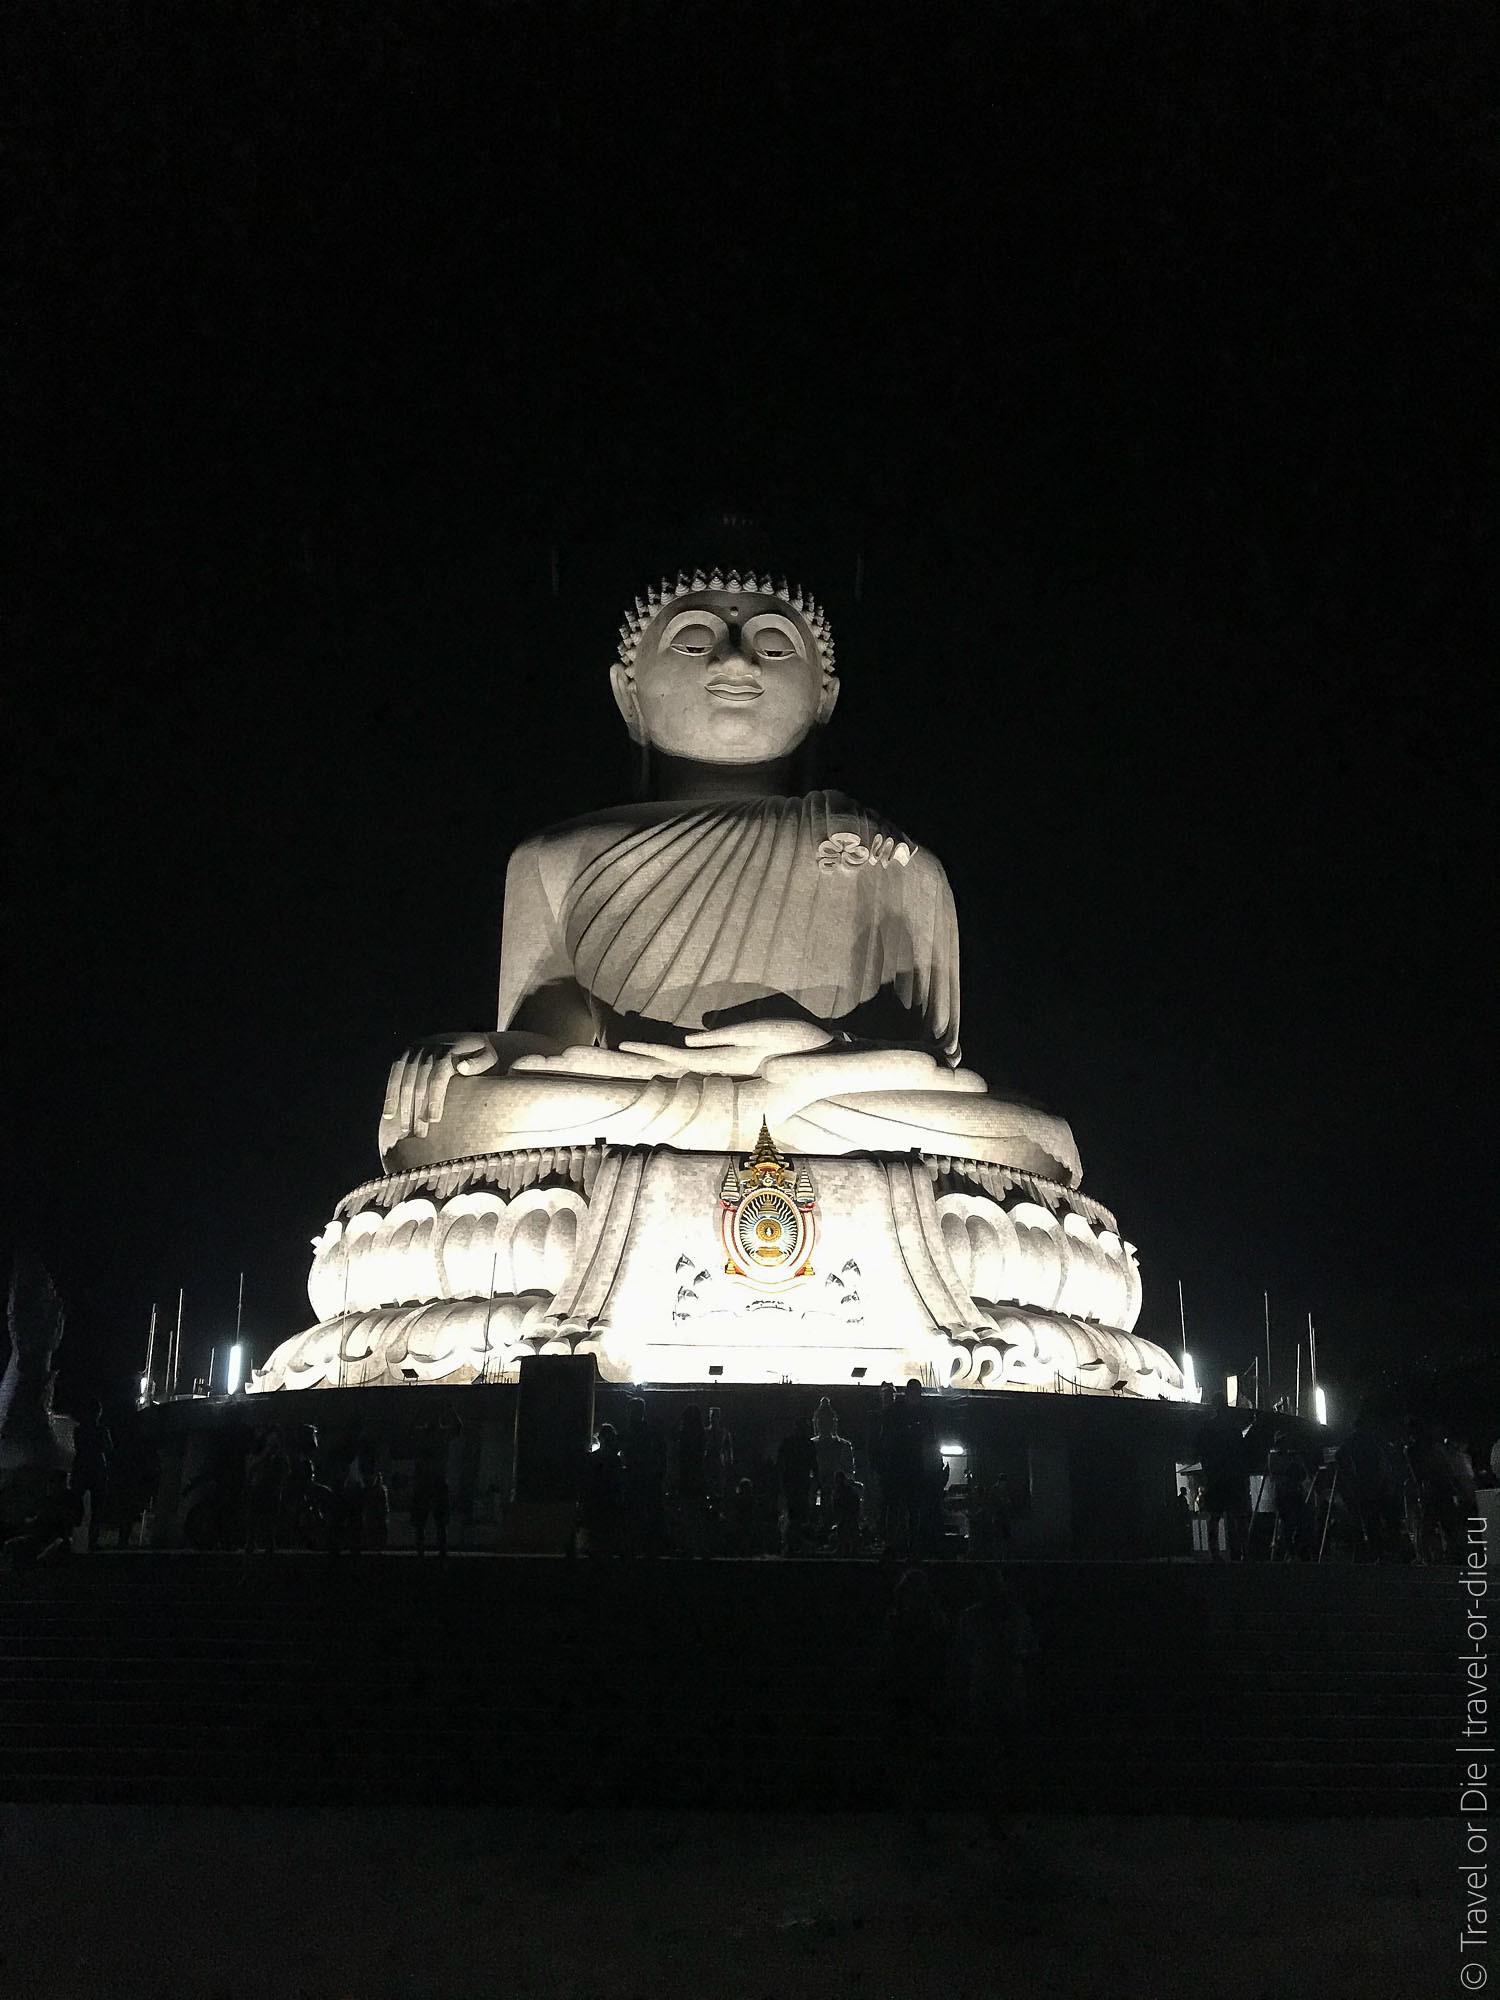 Big-Buddha-Phuket-Большой-Будда-на-Пхукете-ночью-0913